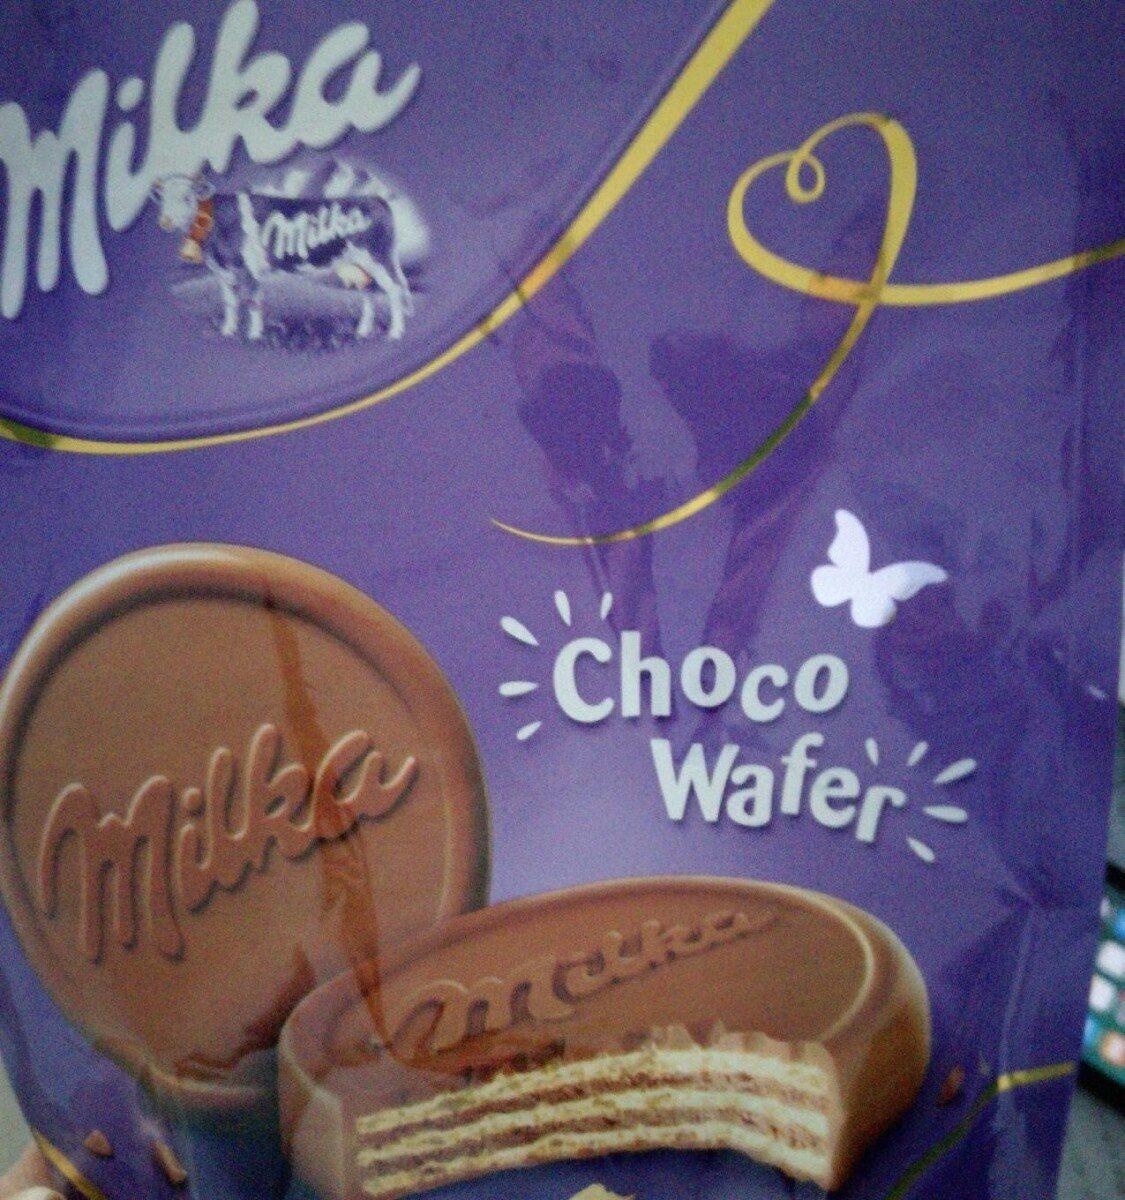 Milka choco wafer - Prodotto - fr